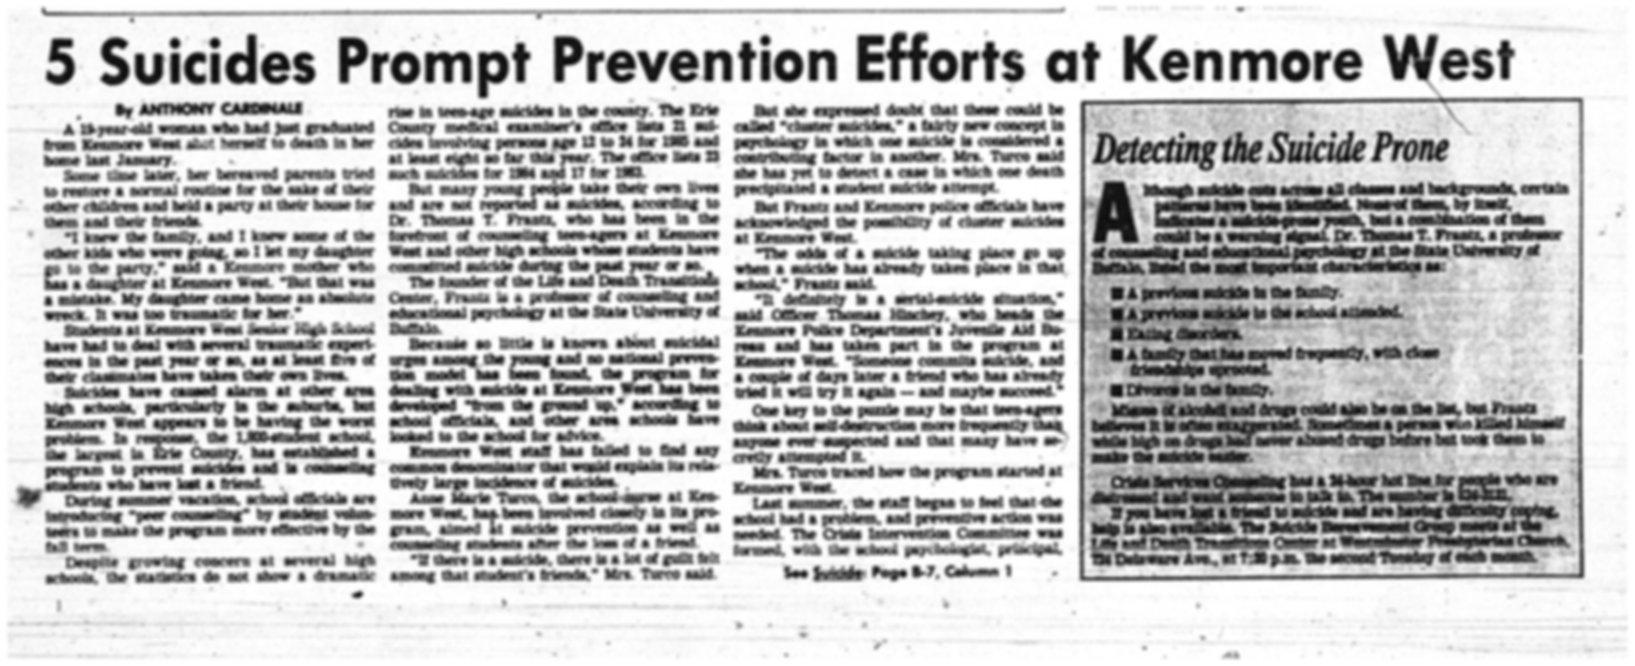 suicides july 13 1986 1.jpg